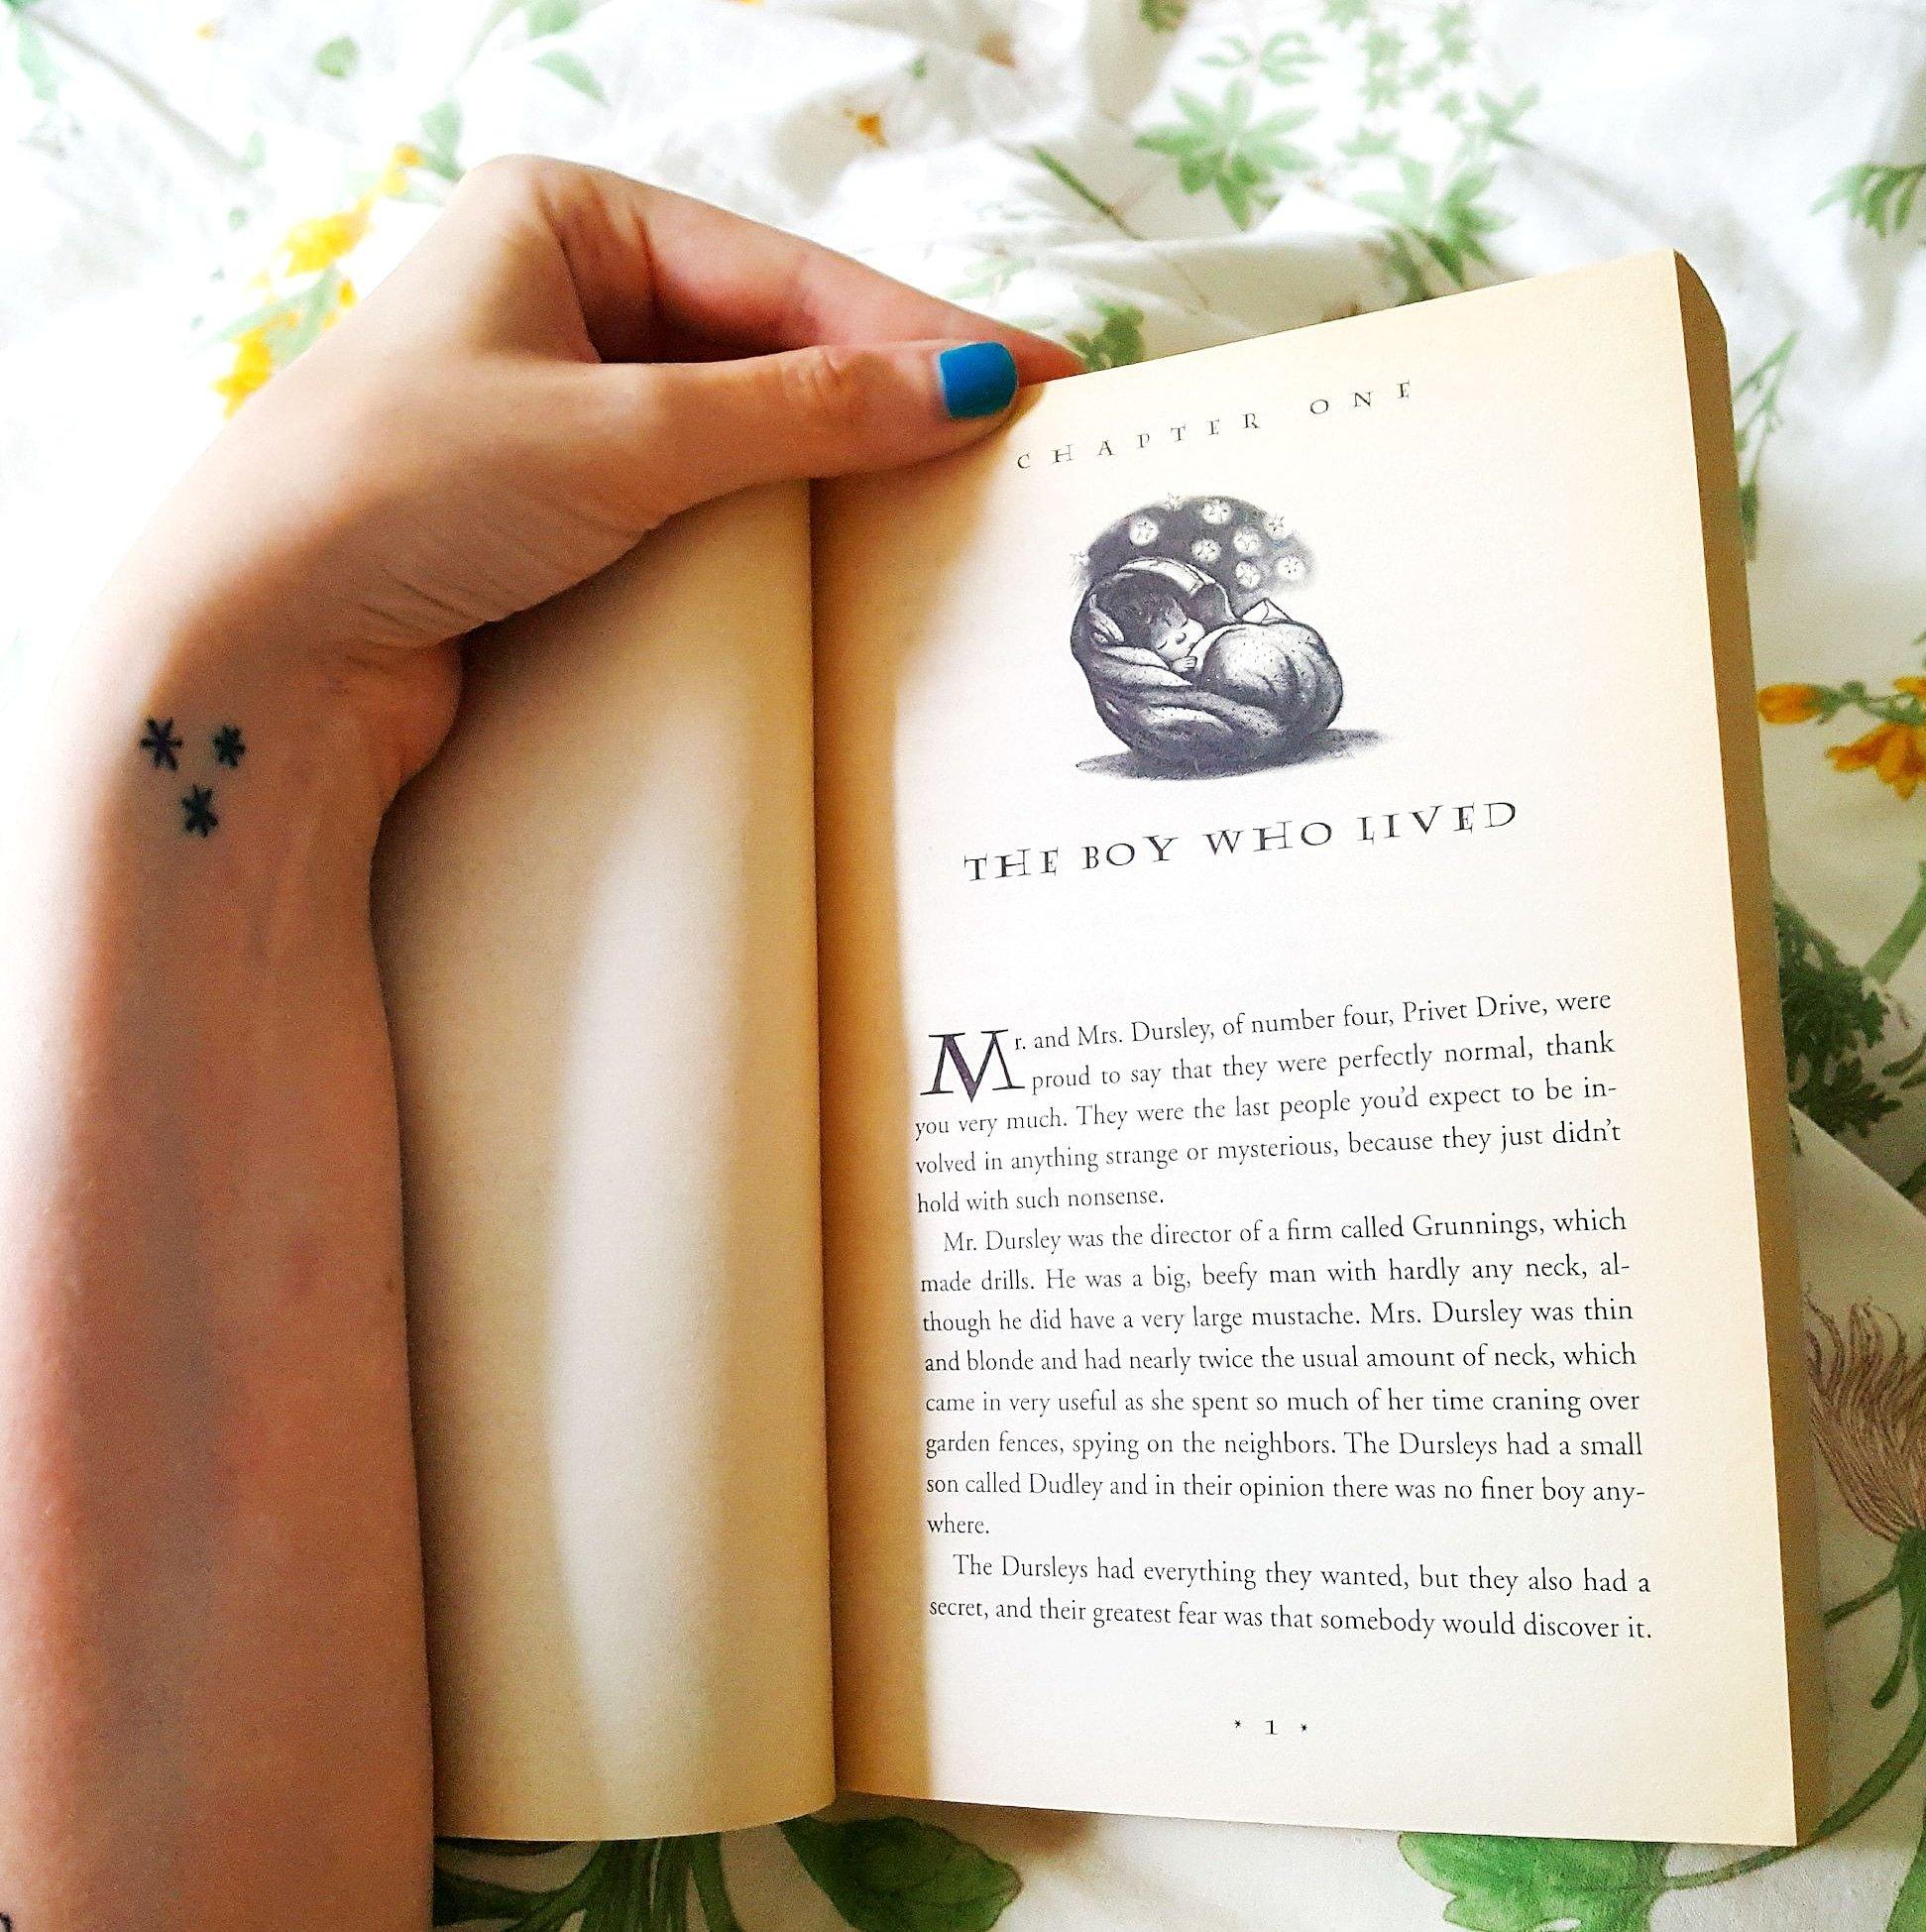 Happy birthday Harry Potter and